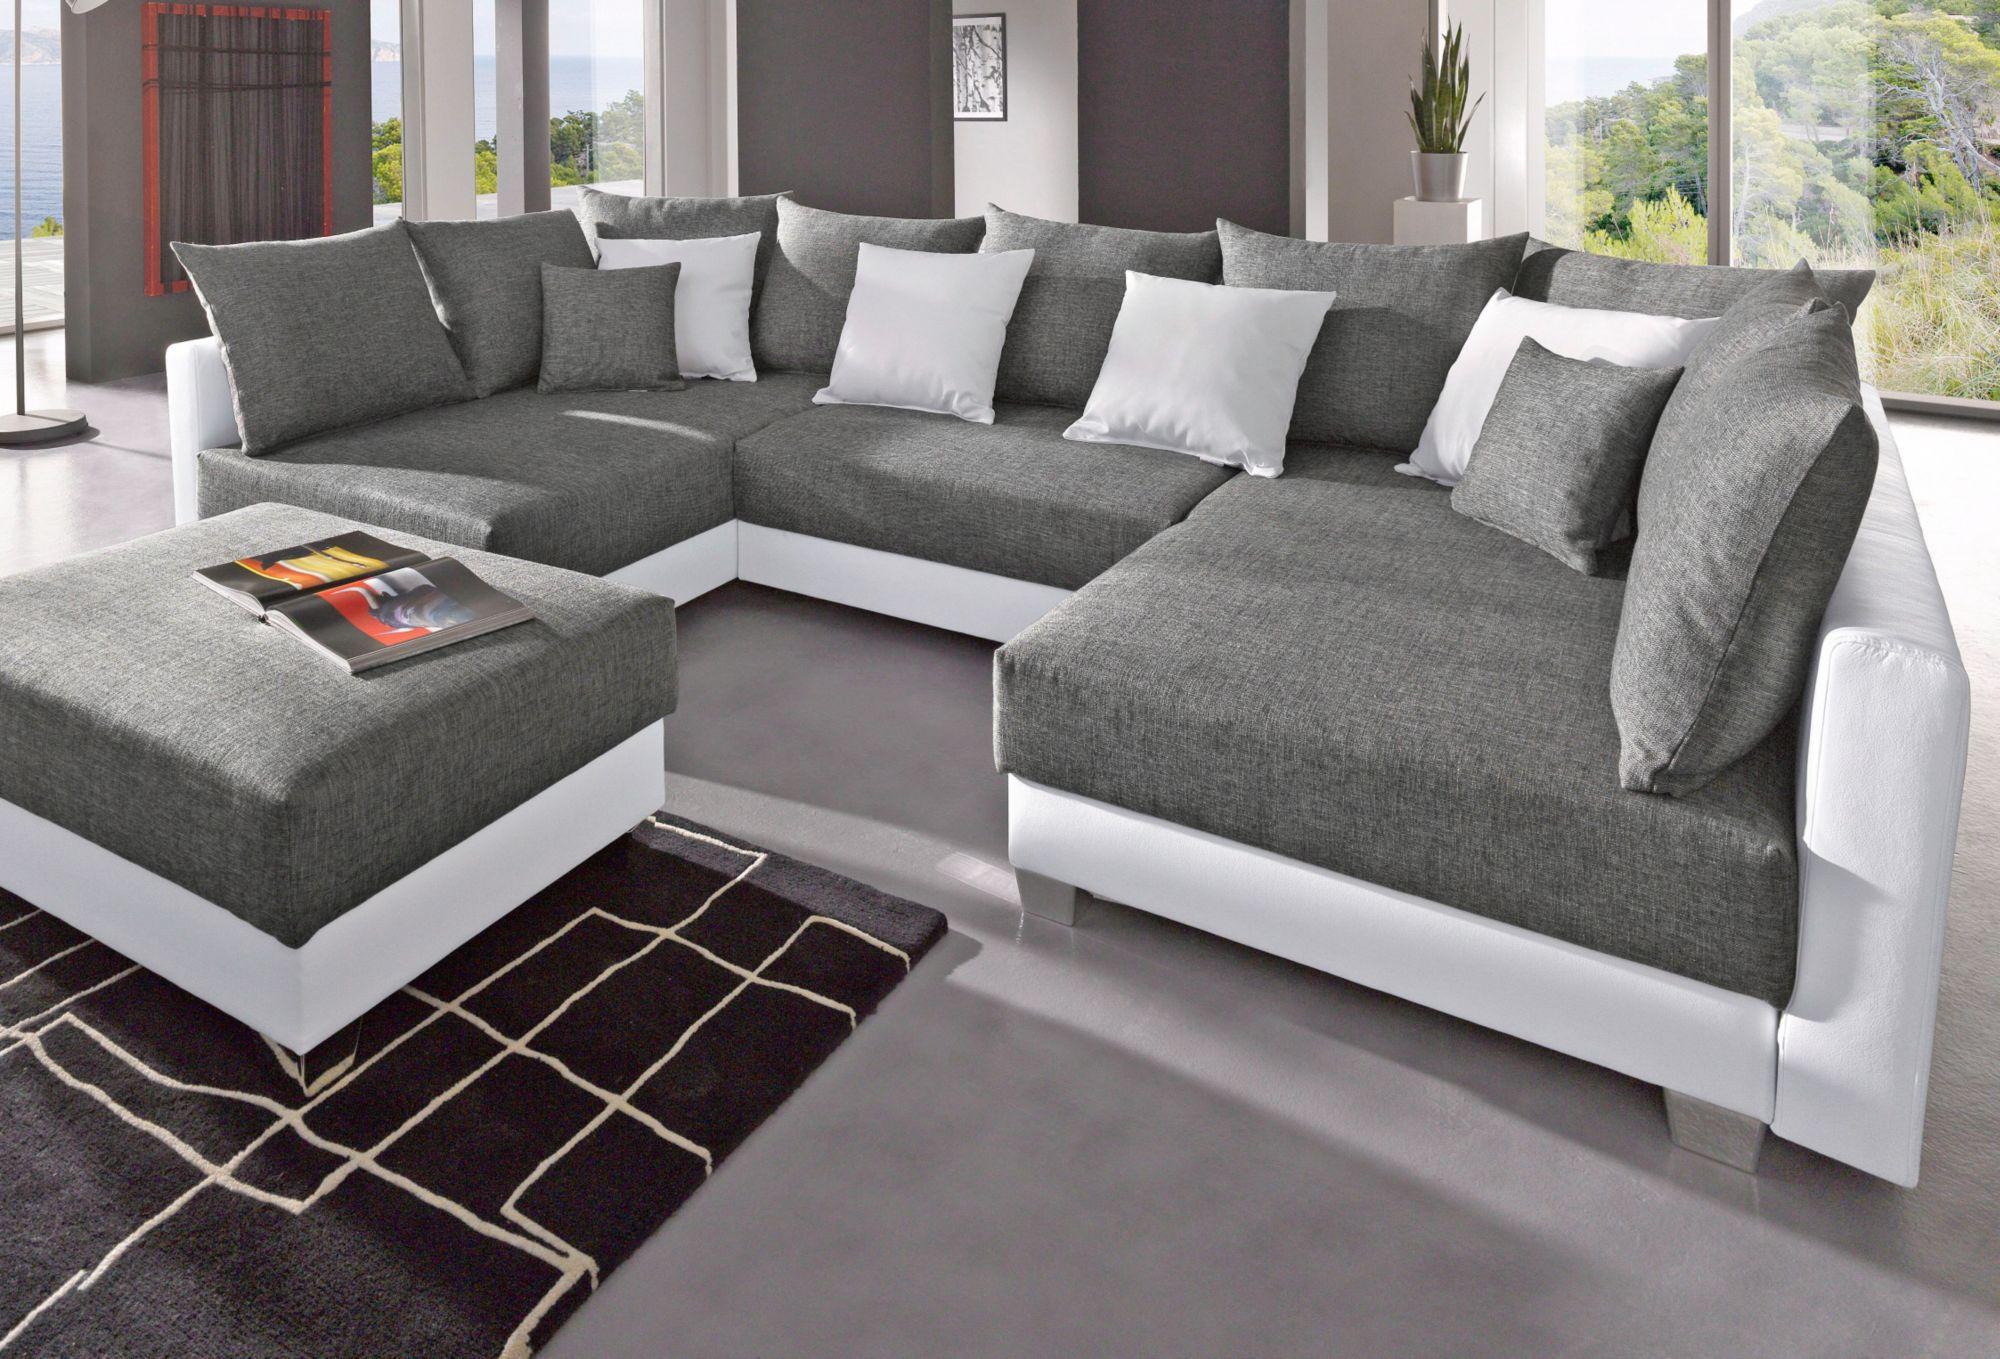 collection ab wohnlandschaft inklusive hocker schwab versand xxl wohnlandschaften. Black Bedroom Furniture Sets. Home Design Ideas